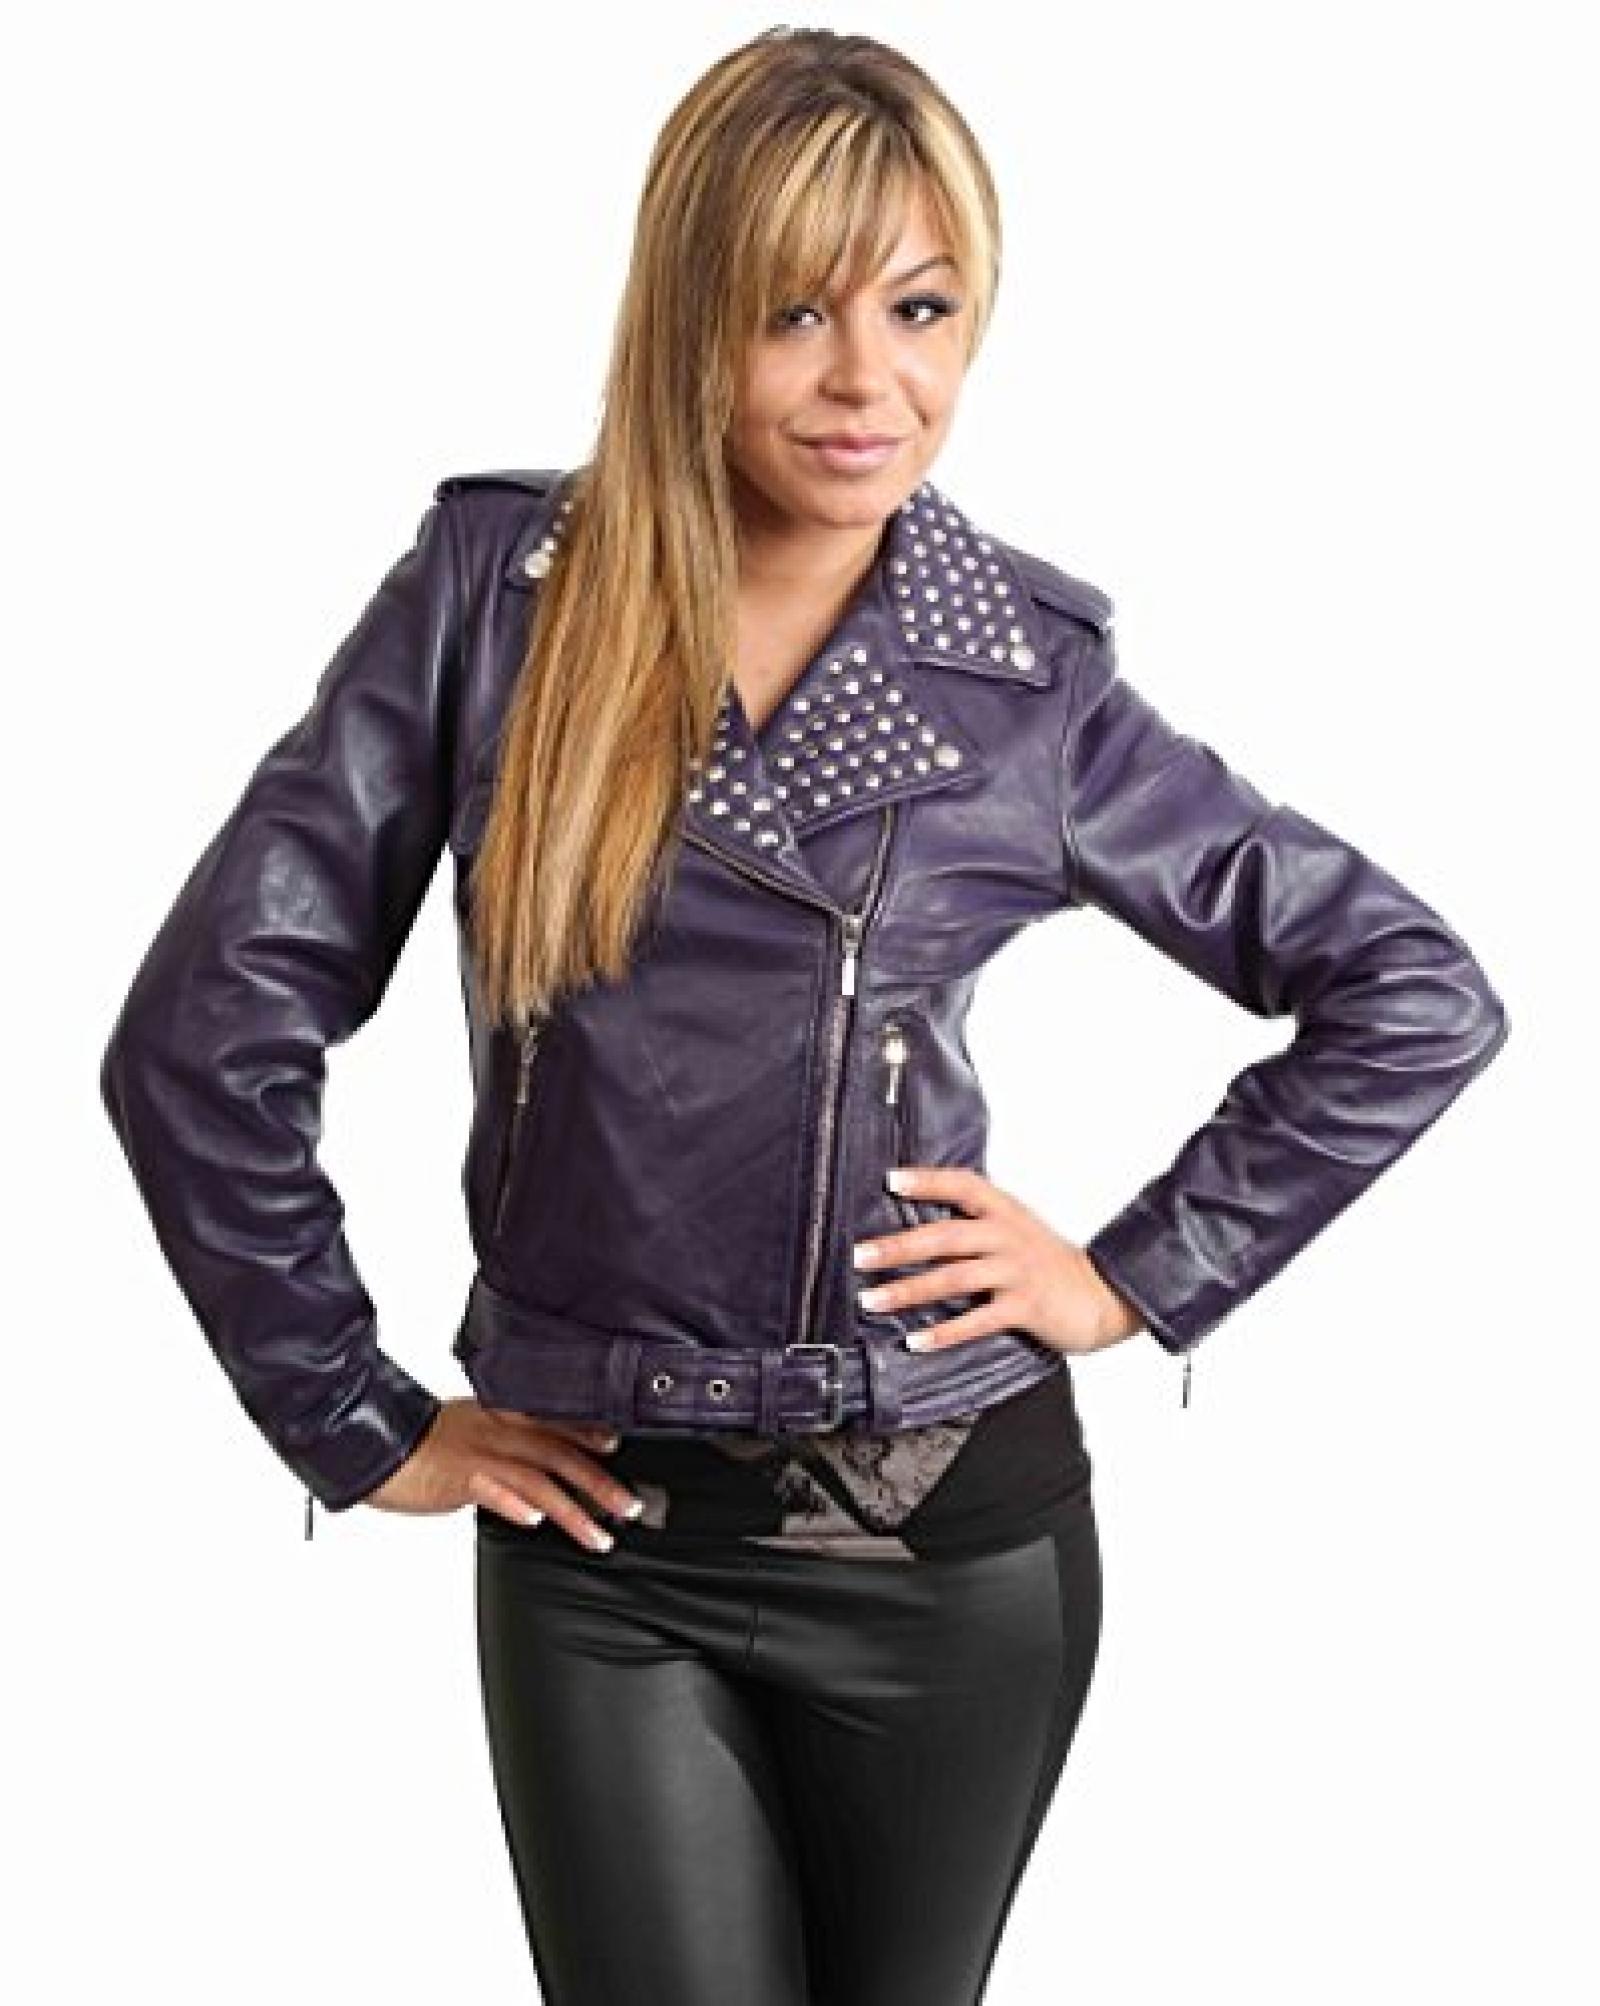 Damen Motorradfahrer Lederjacke neuen Biker Jacke SALLY dunkel lila